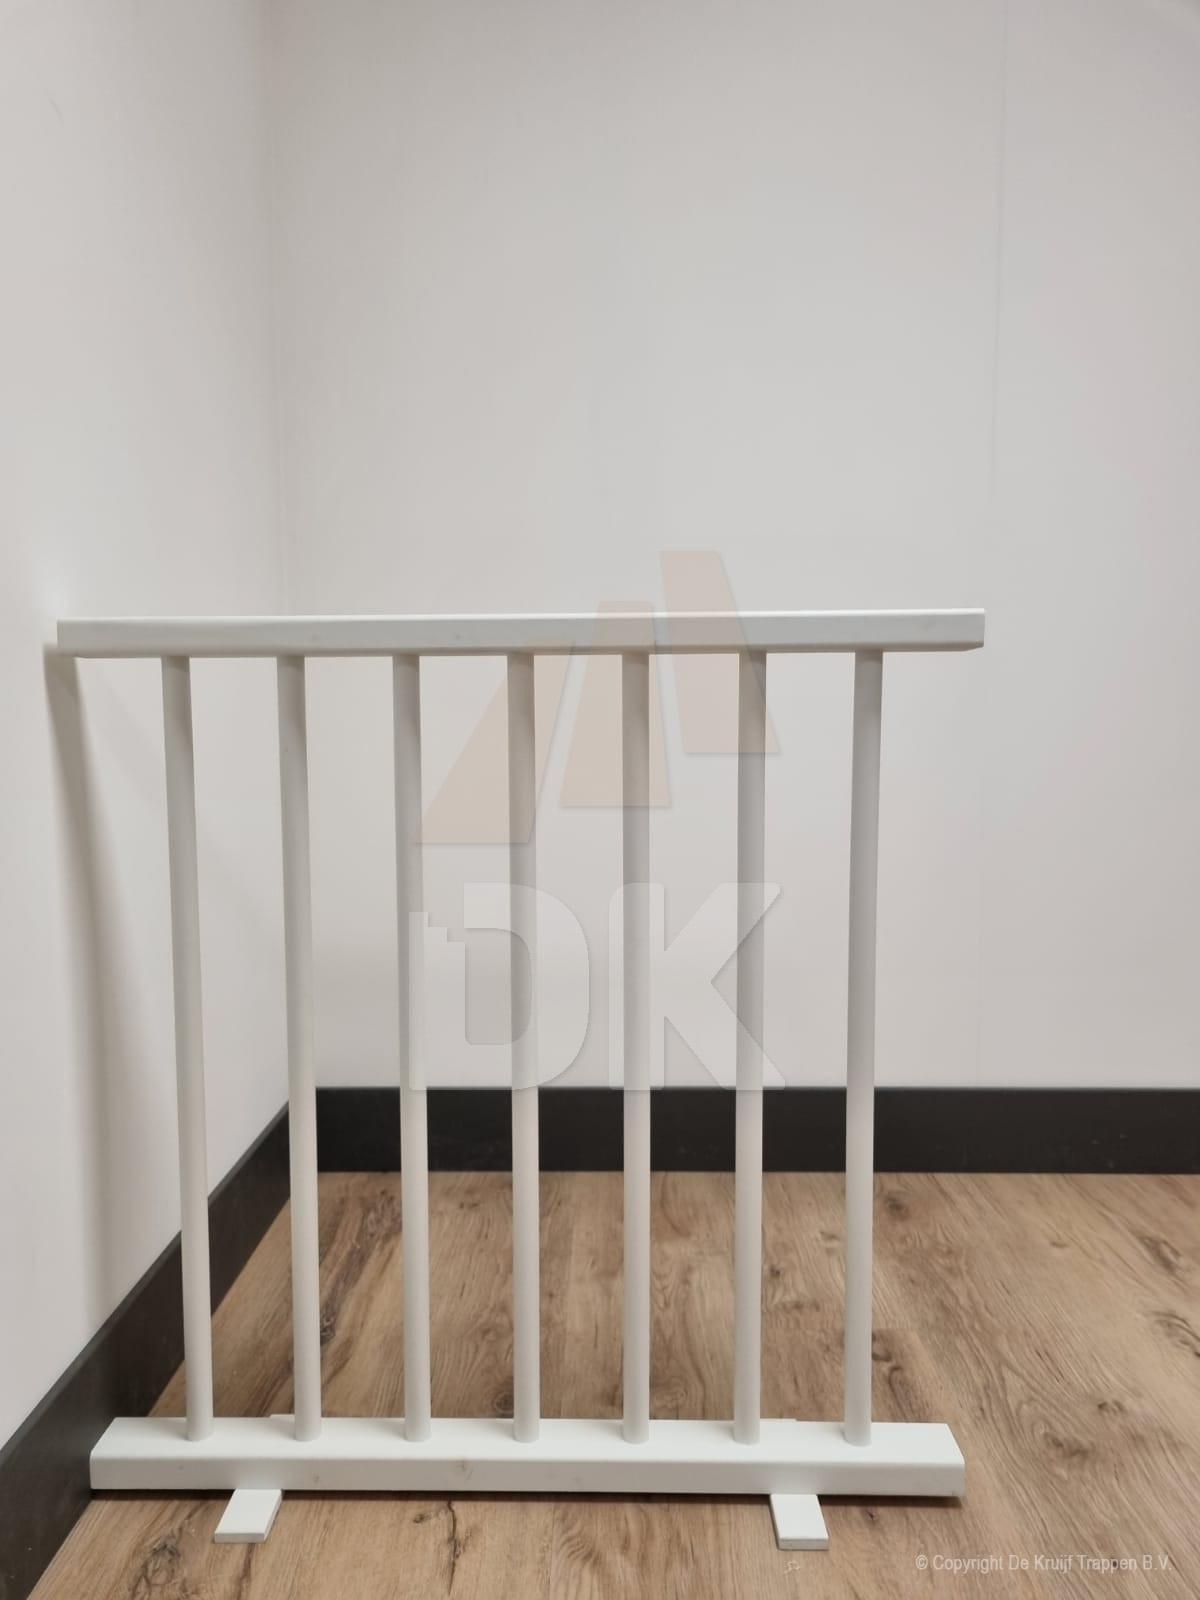 Balustrade houten spijlen - H1000